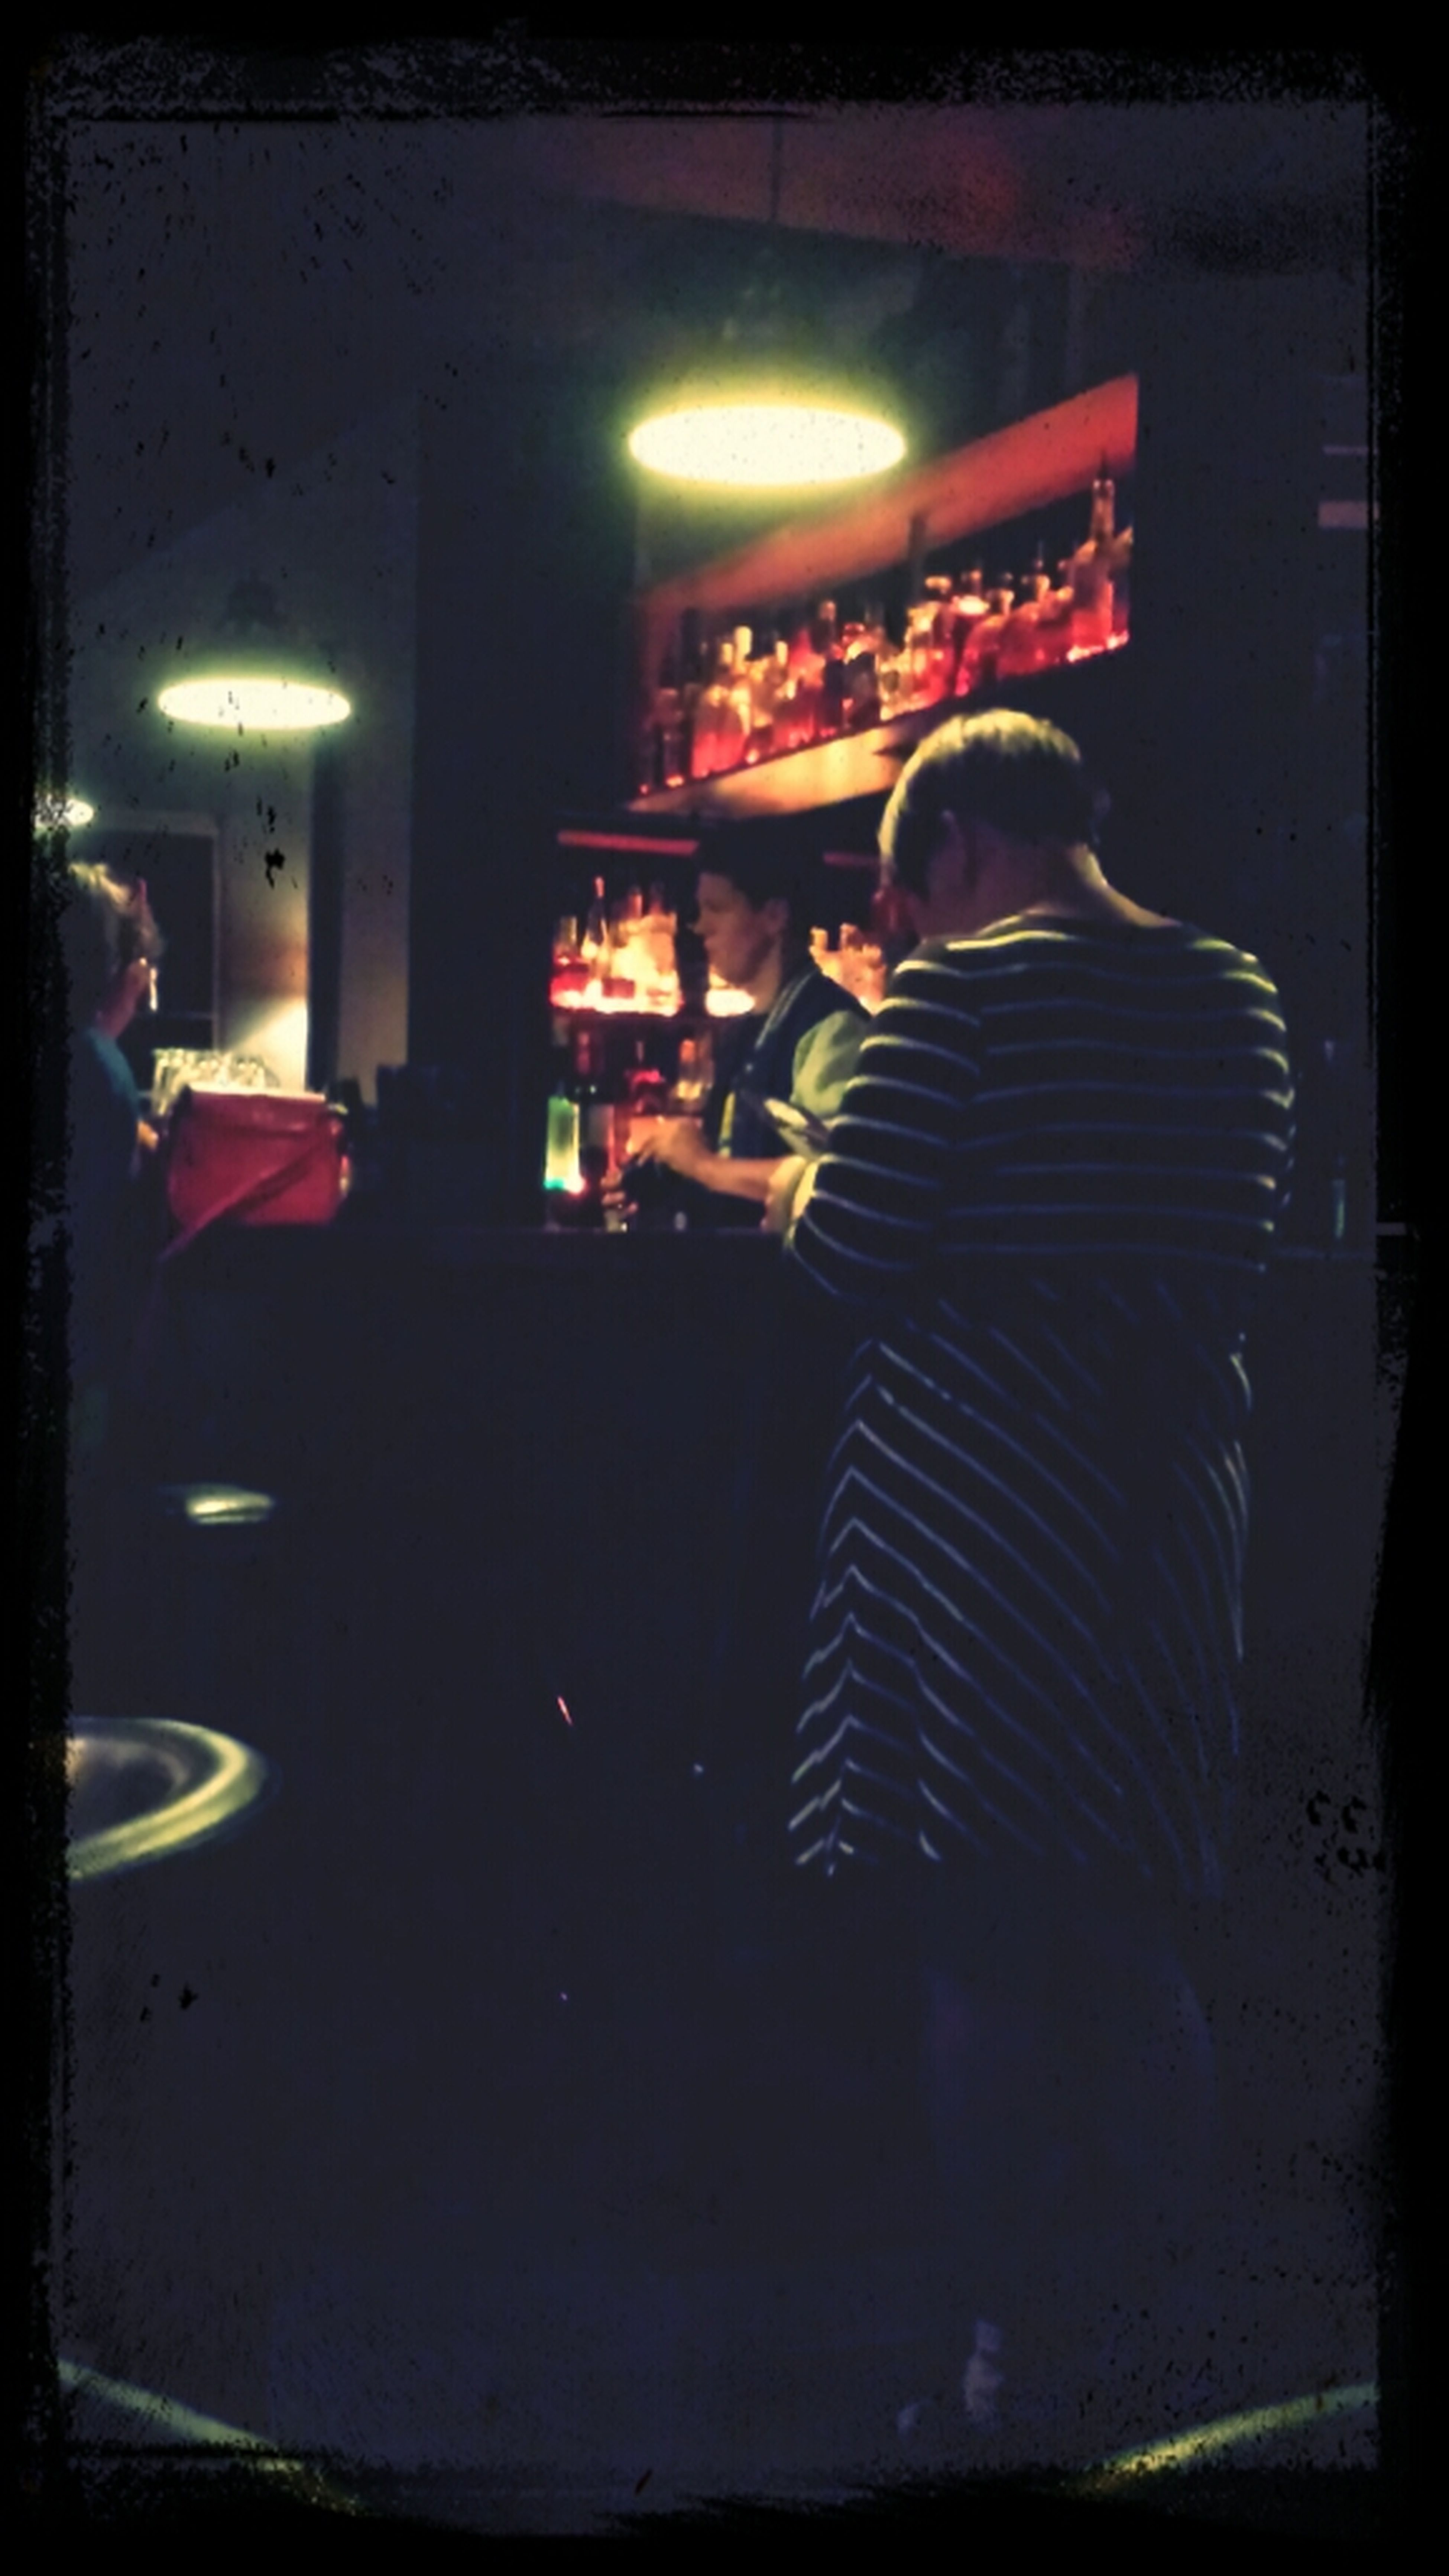 taking jackies cocktails